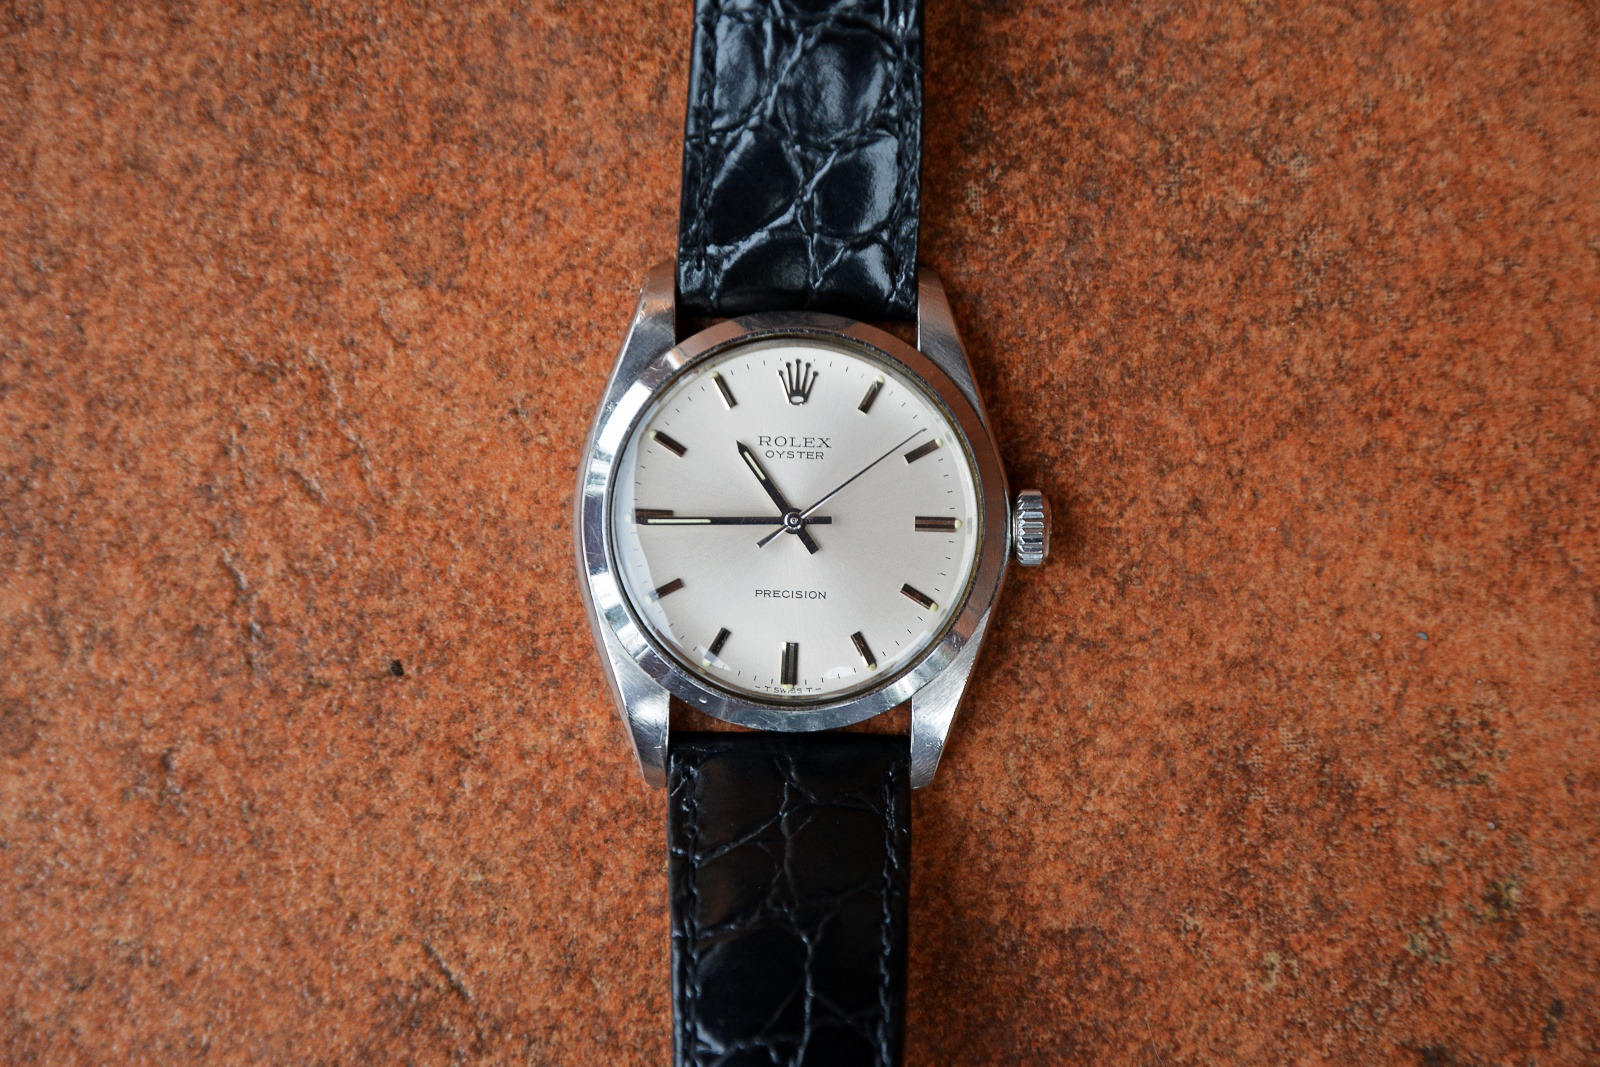 Rolex Oyster Precision '~72 Cal. 1220 Ref. 6426